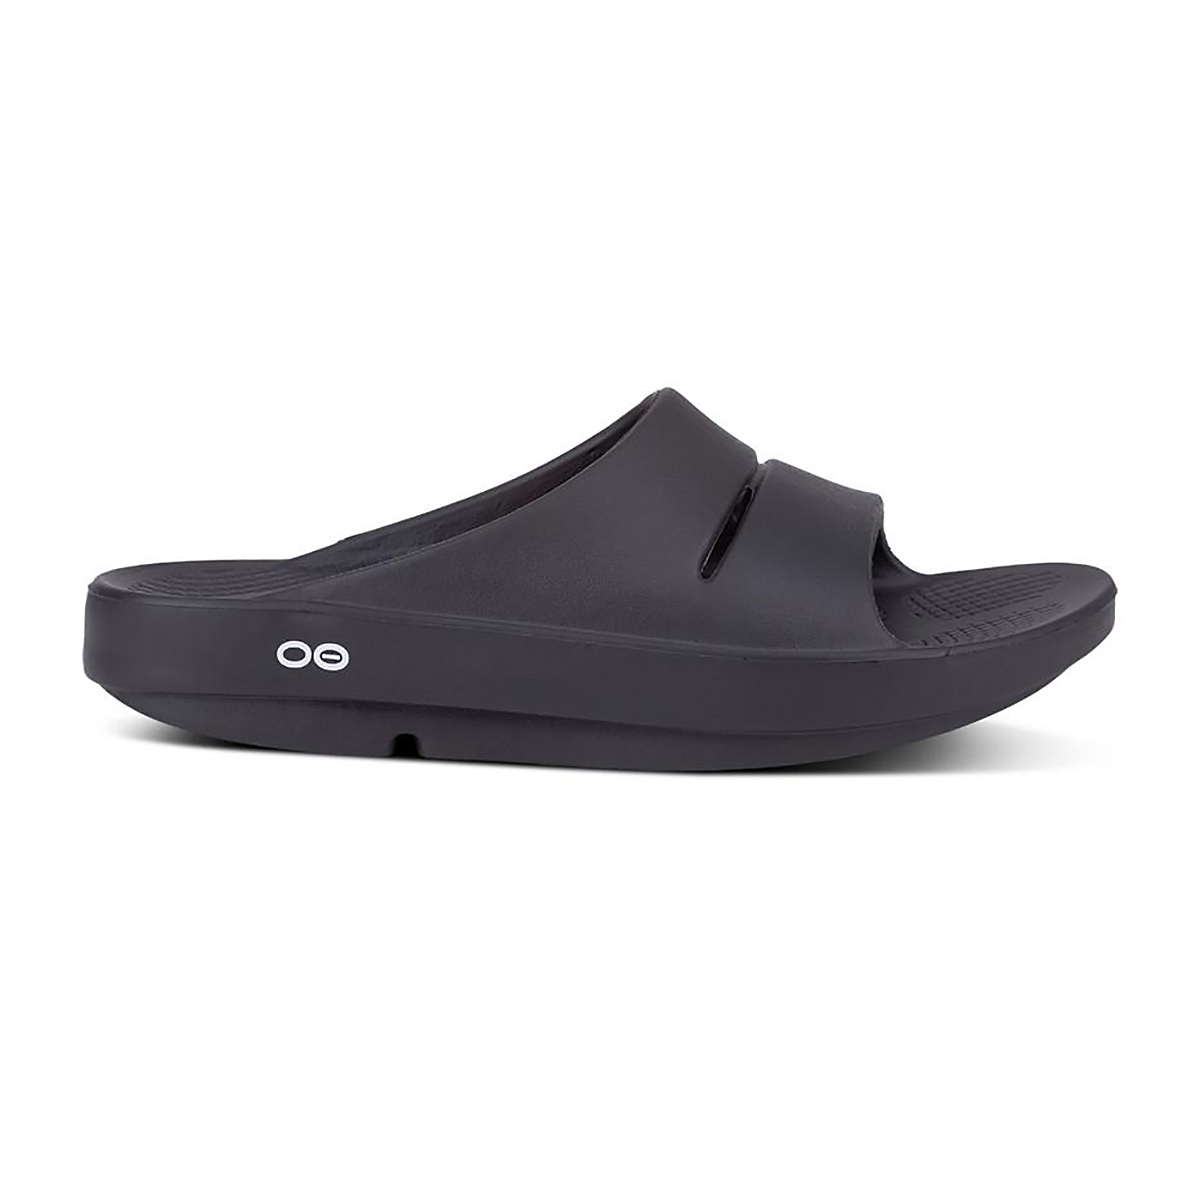 Oofos OOahh Recovery Slide - Color: Black - Size: M7/W9 - Width: Regular, Black, large, image 1